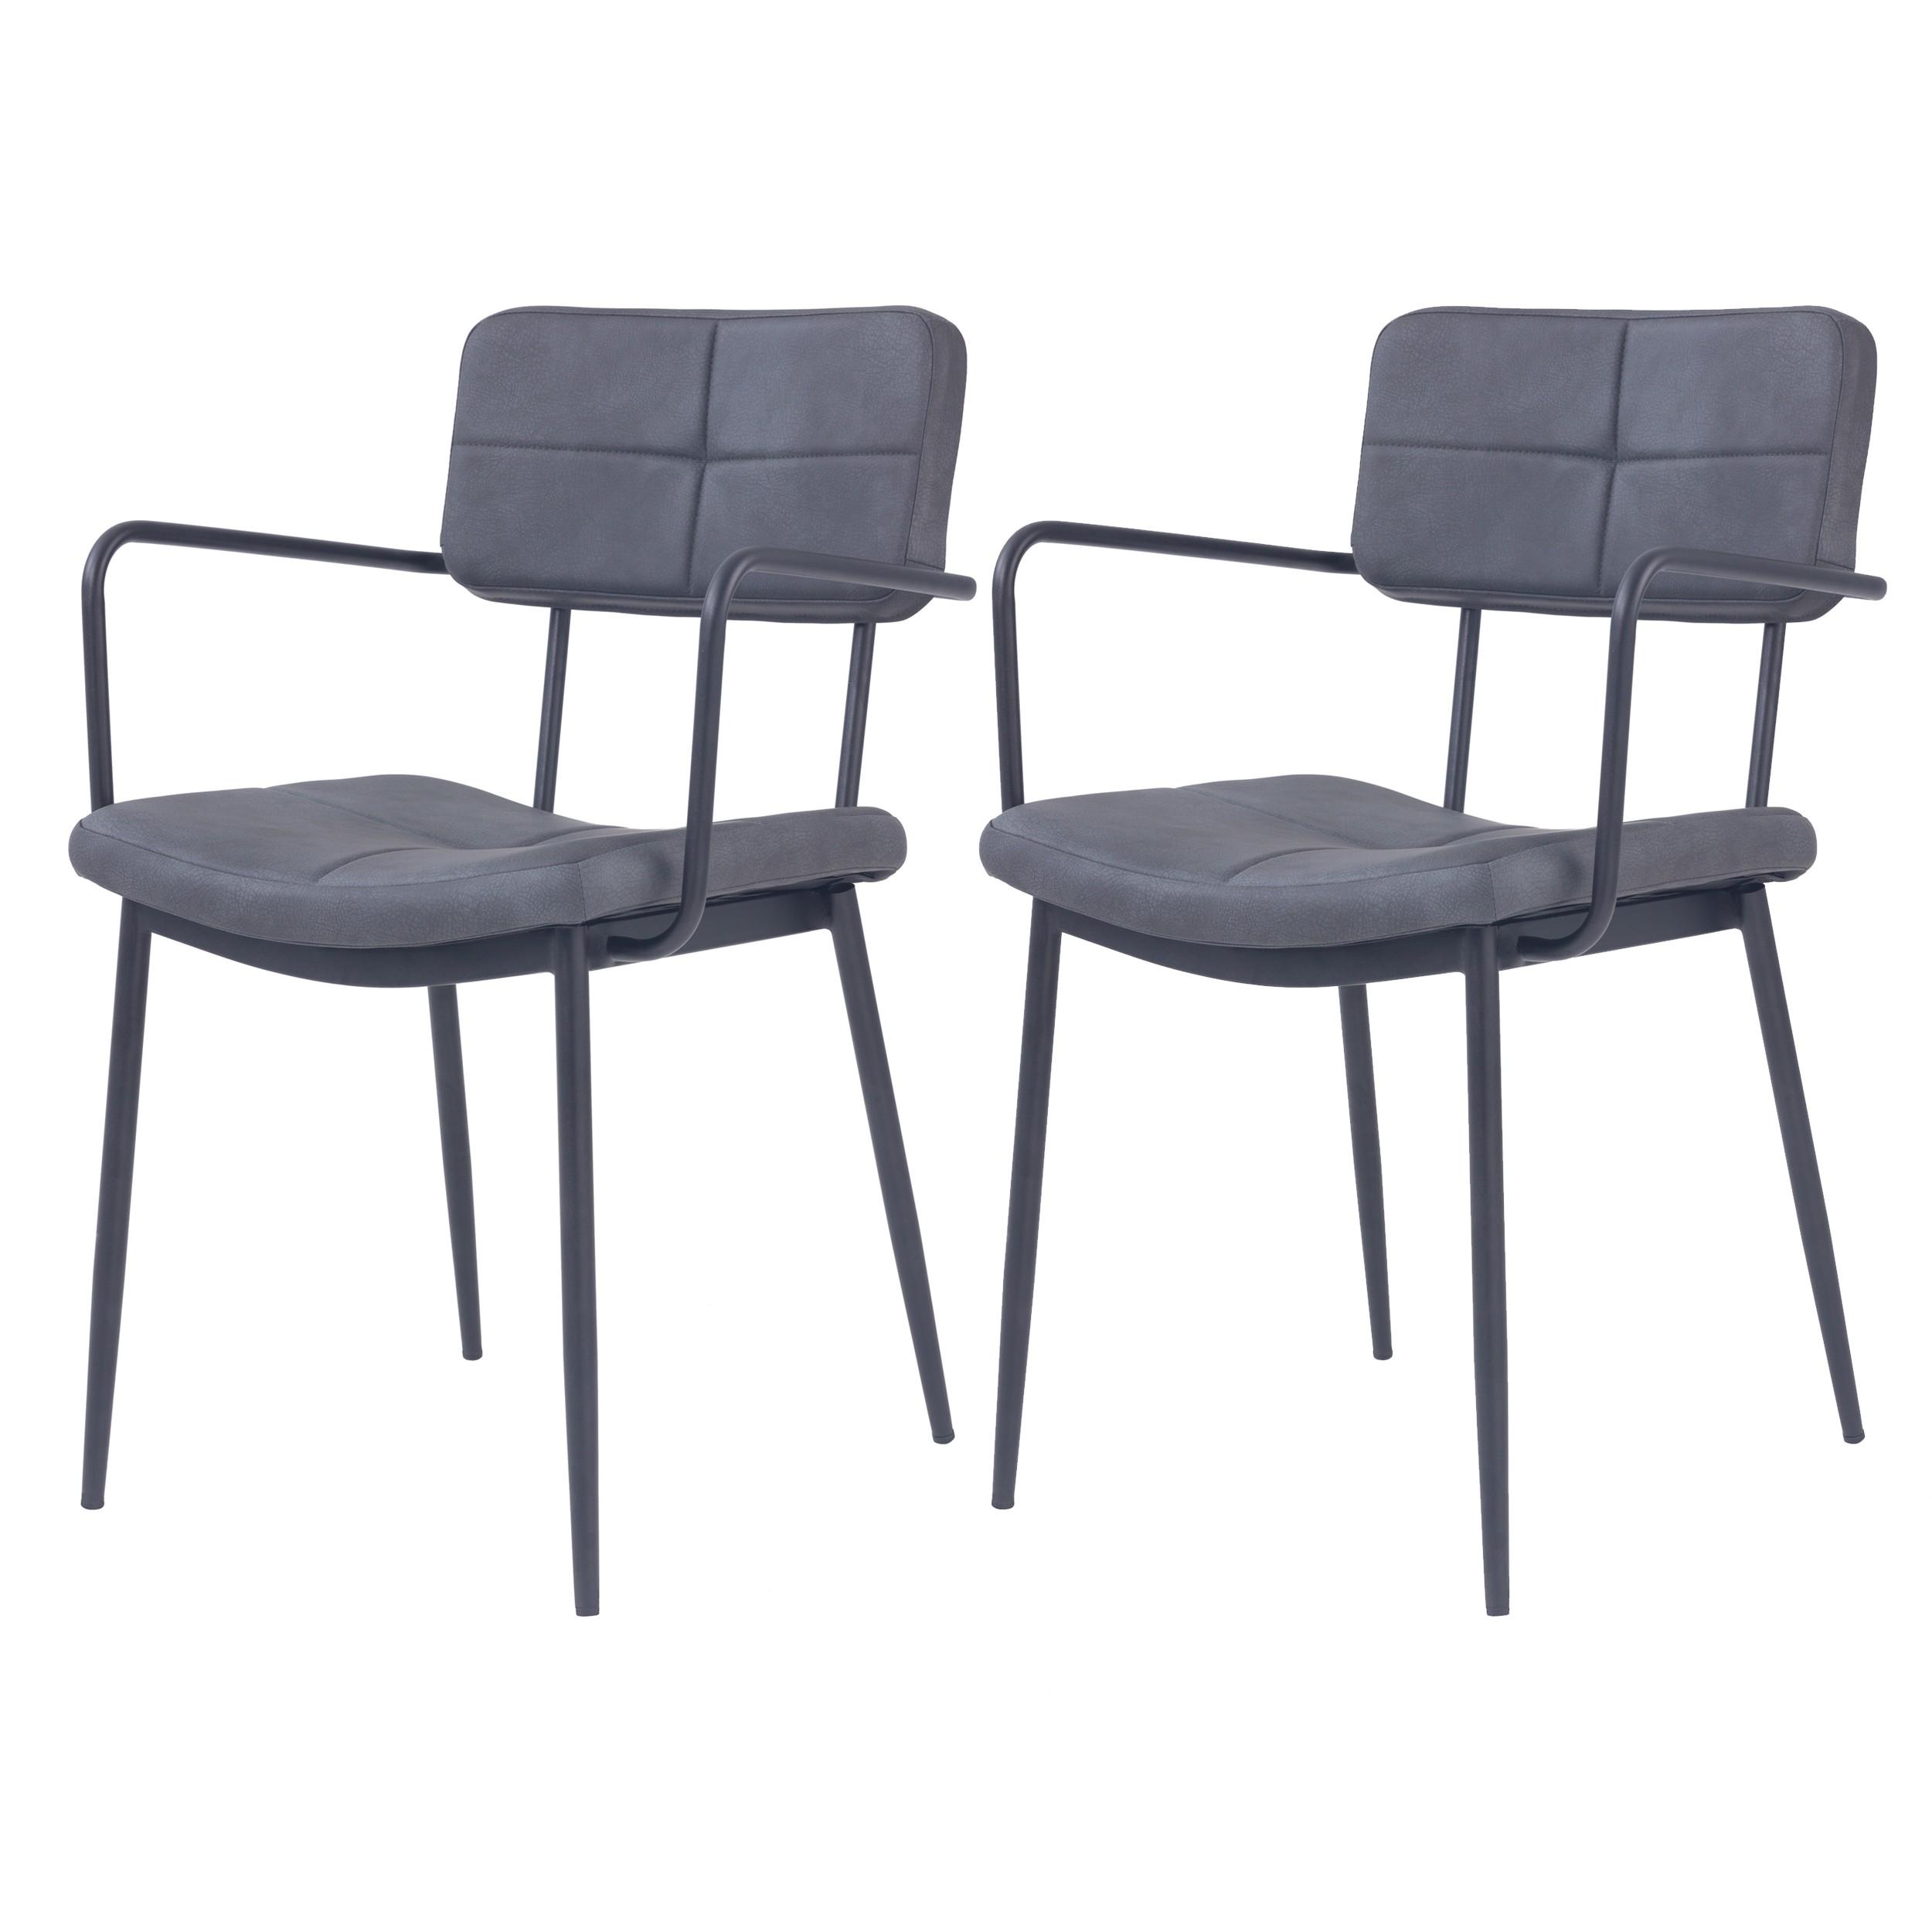 acheter chaise avec accoudoirs en cuir simili noir